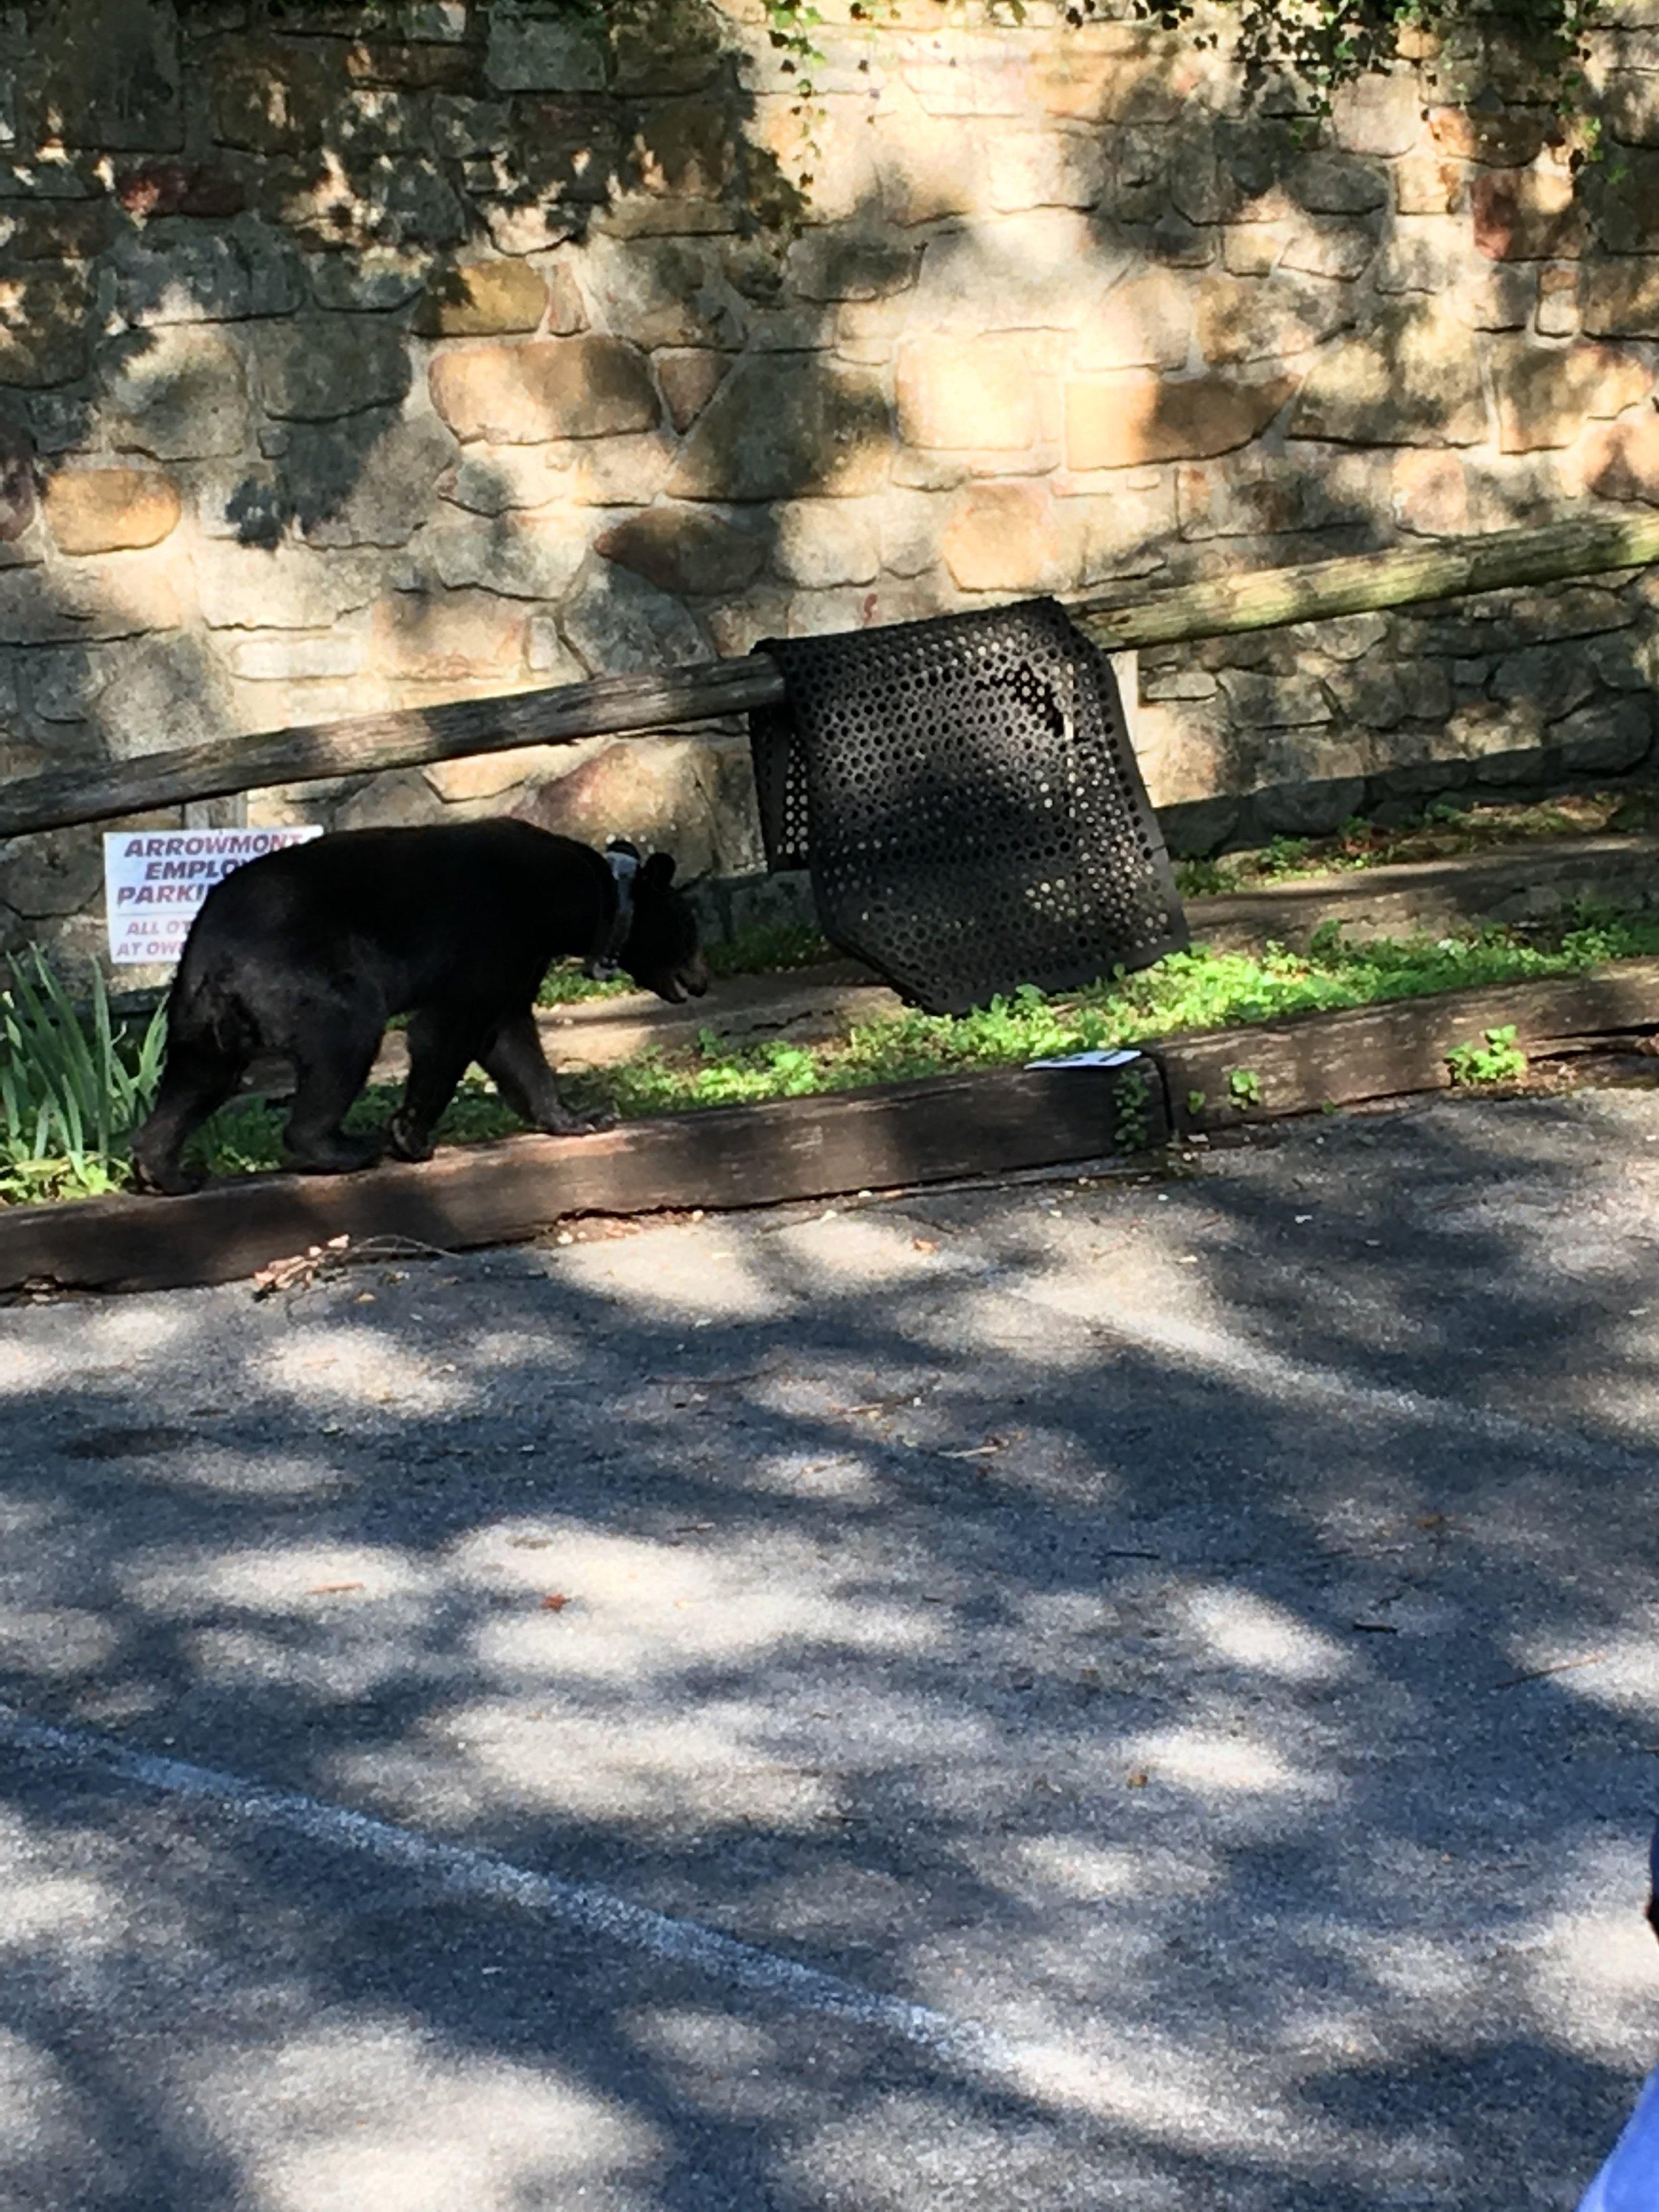 bear+at+Arrowmont.jpg